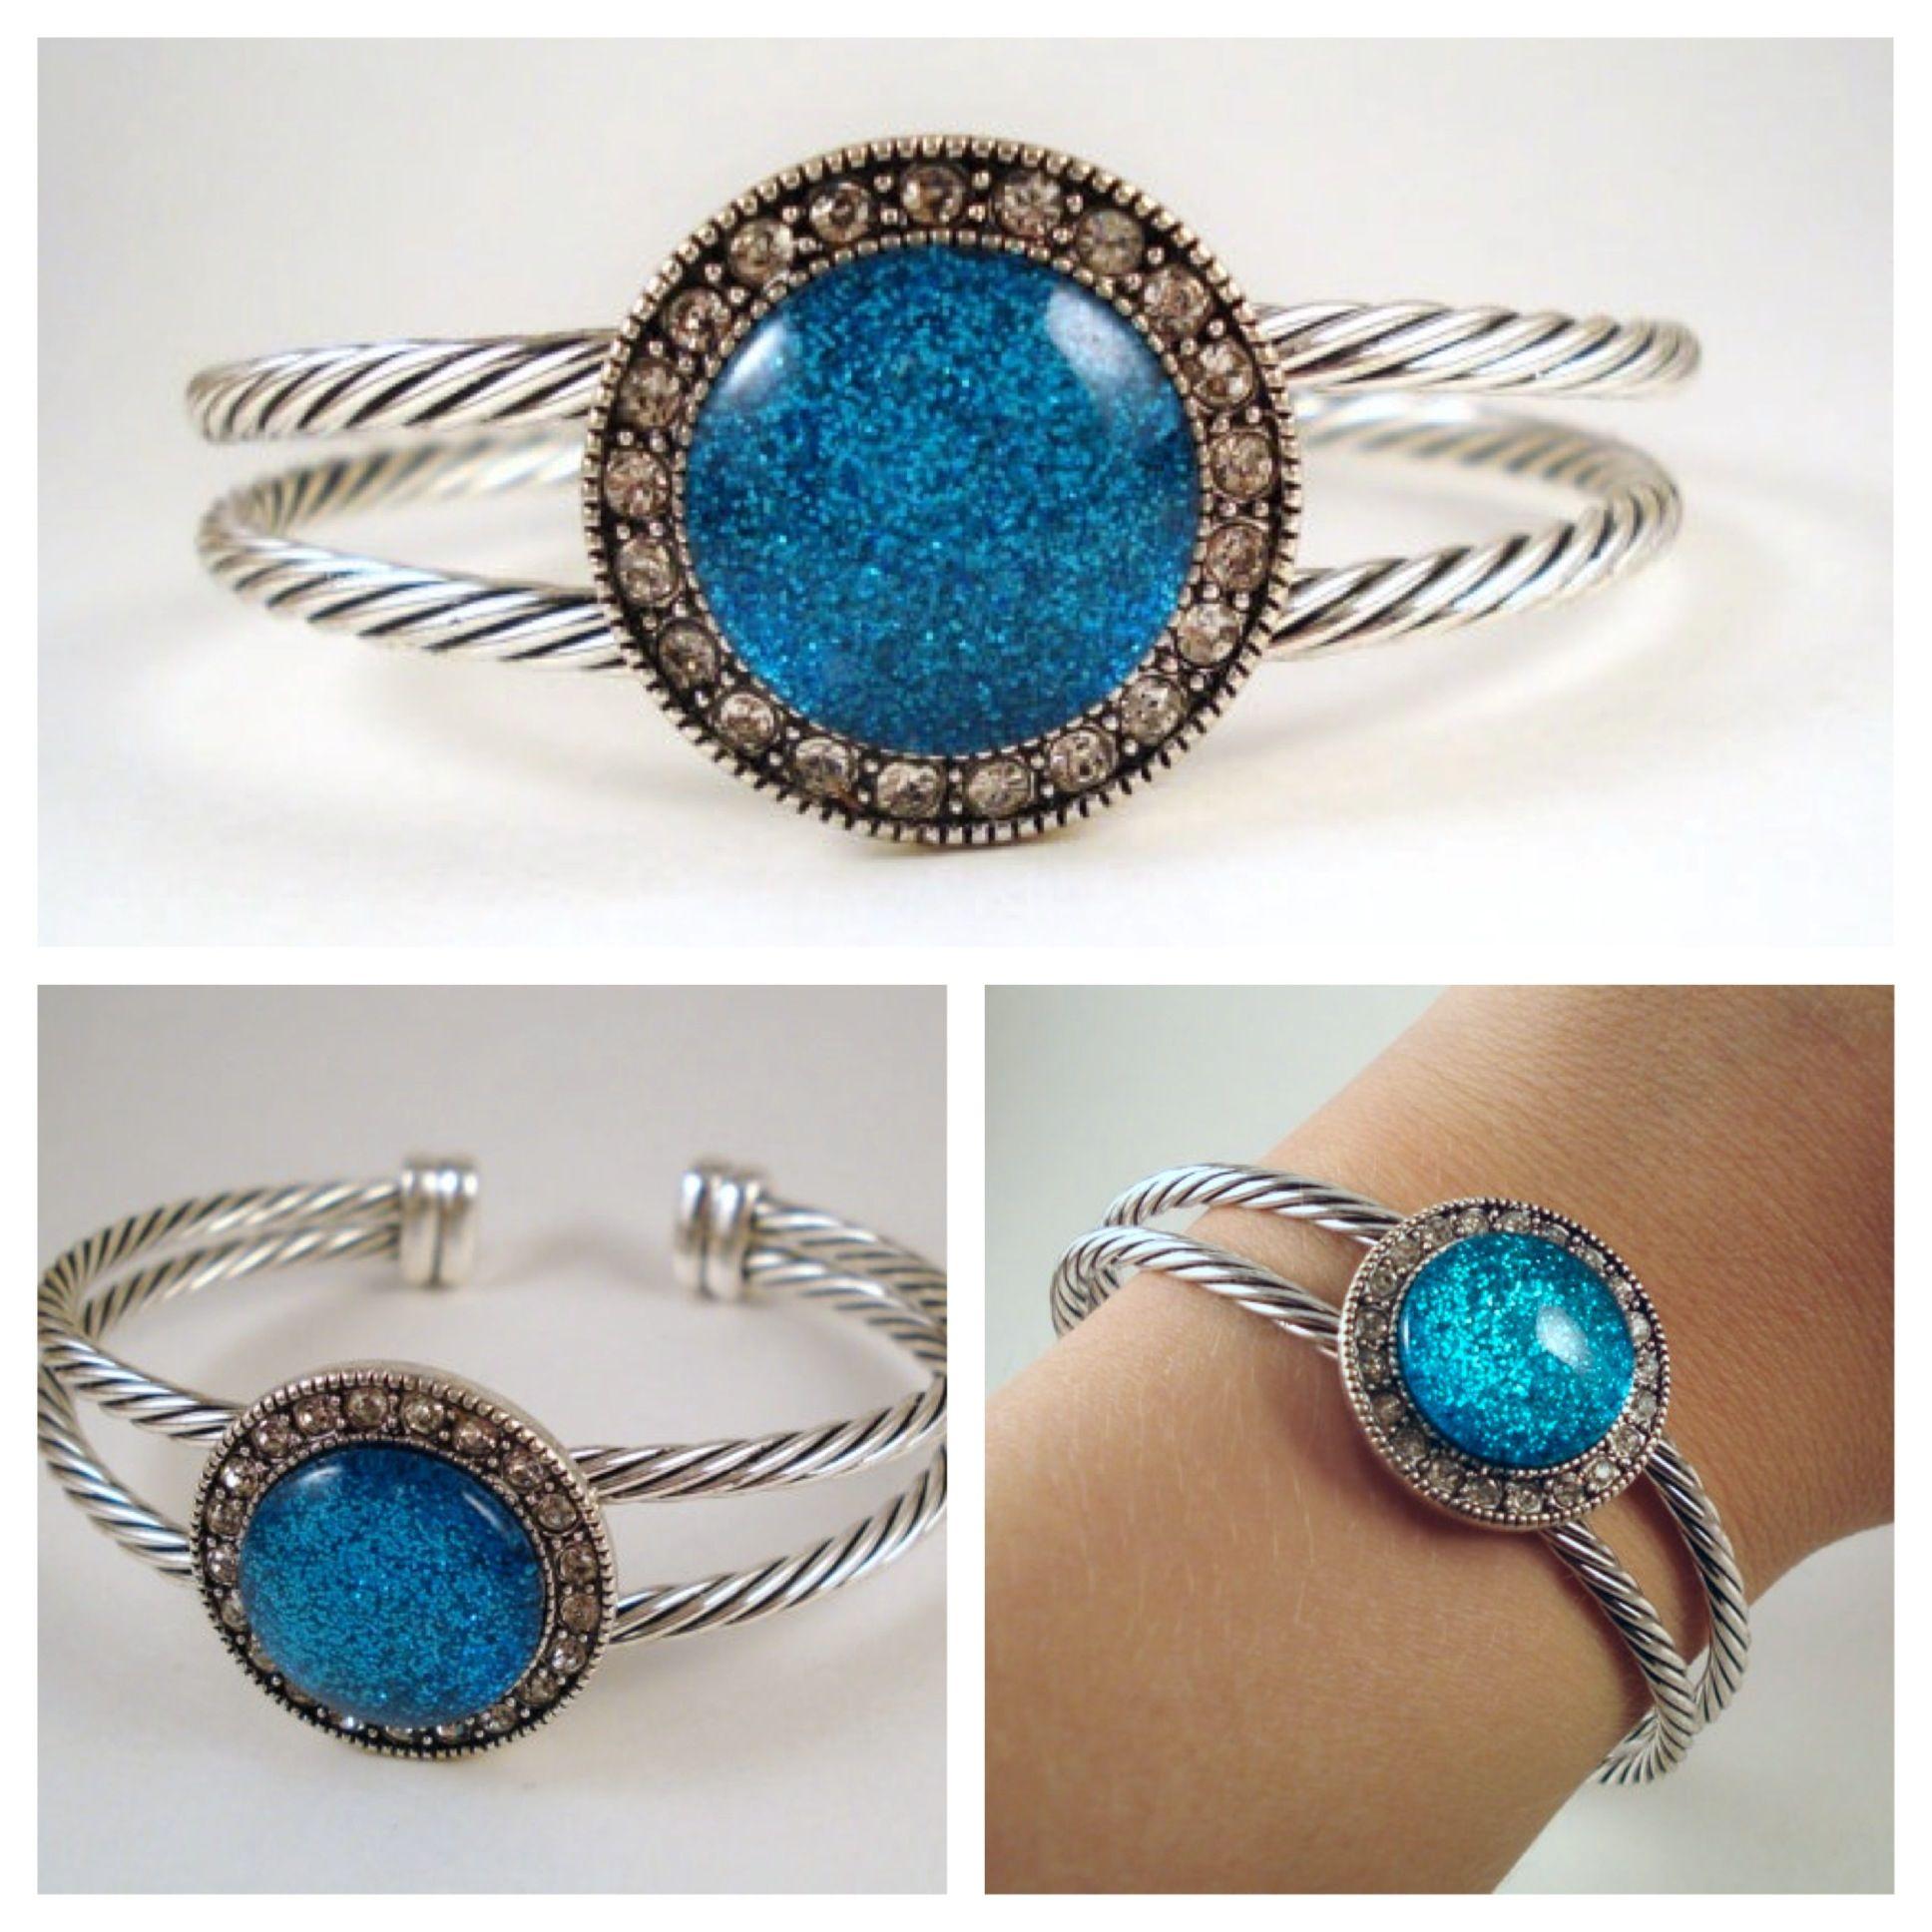 Pin By Kim At ECrafty.com On Nail Polish Jewelry